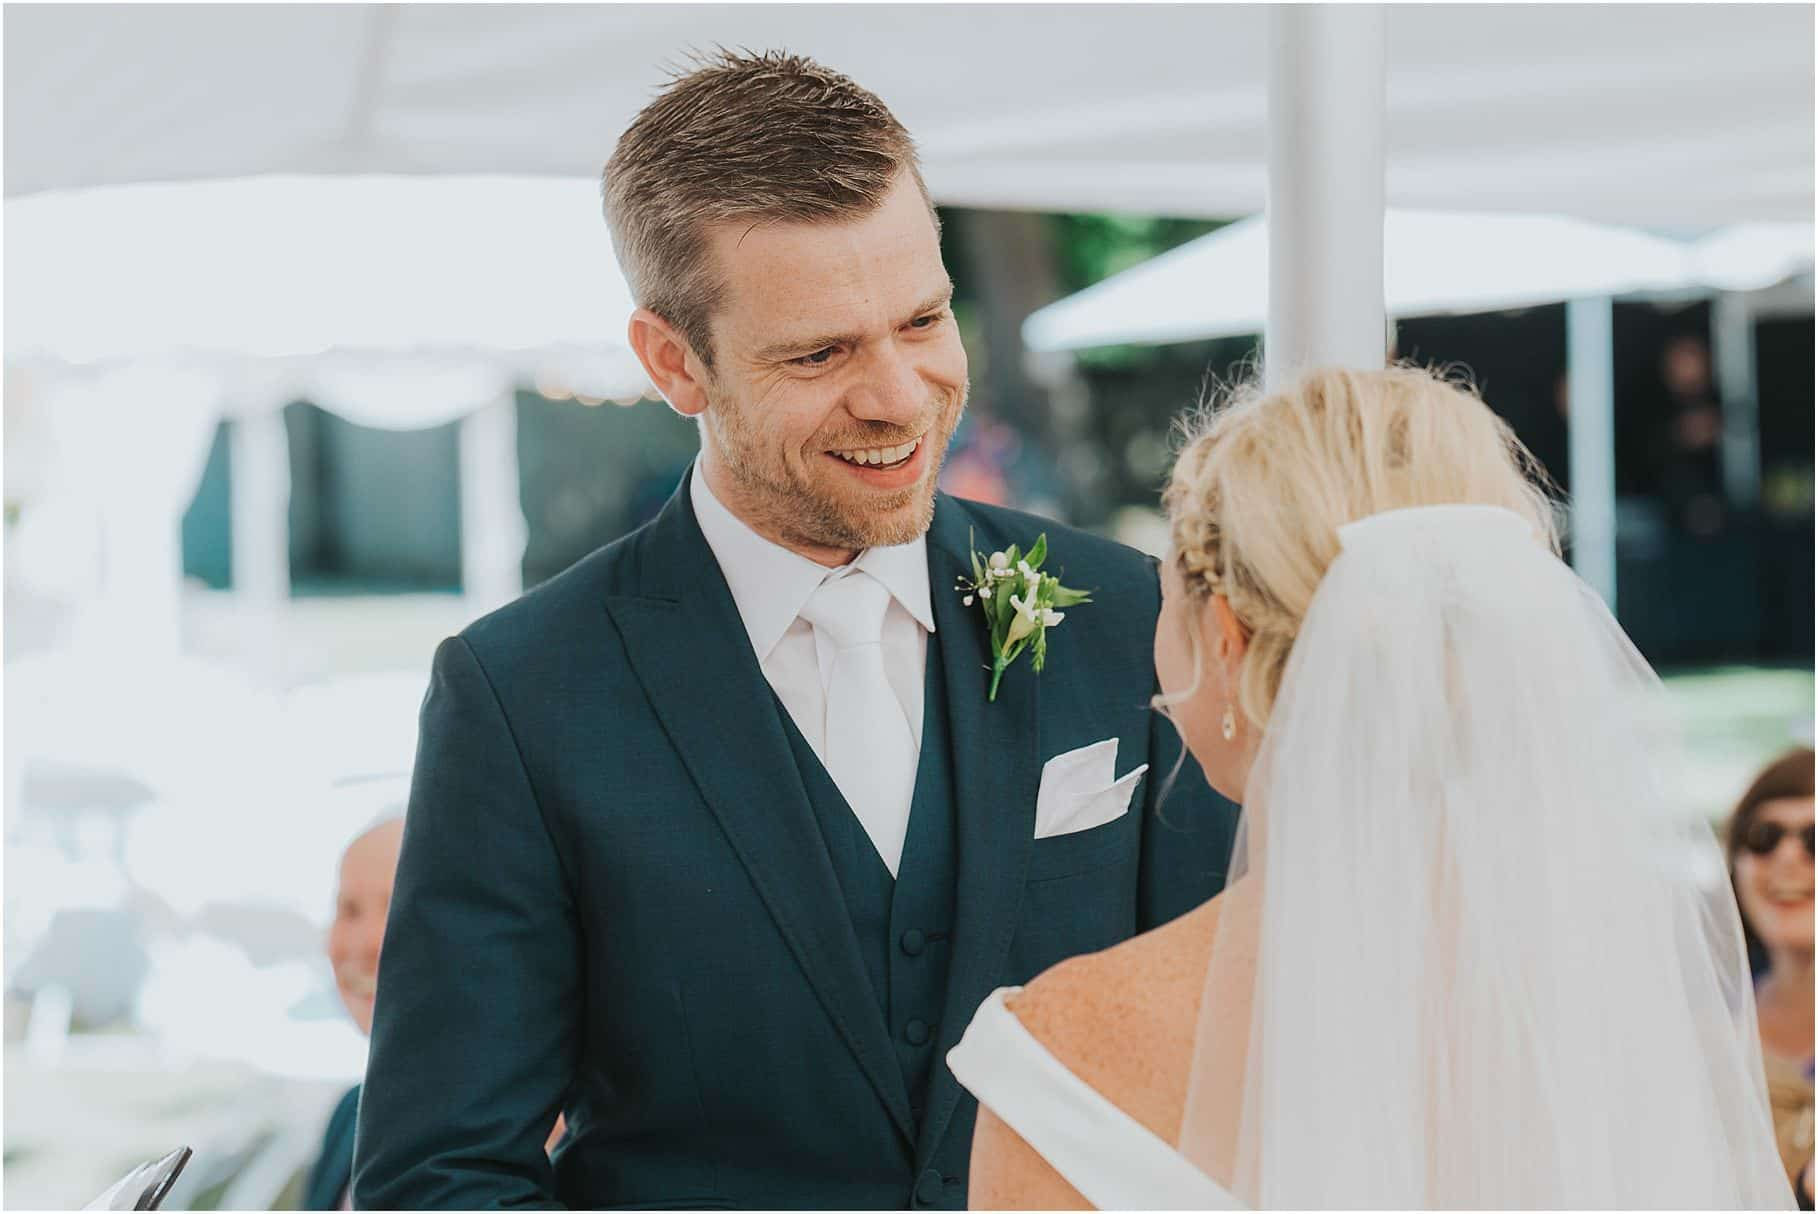 Cambridgeshire Wedding Photographer Black Horse Elton Wedding 1041 - Mr and Mrs Mac // CAMBRIDGESHIRE WEDDING